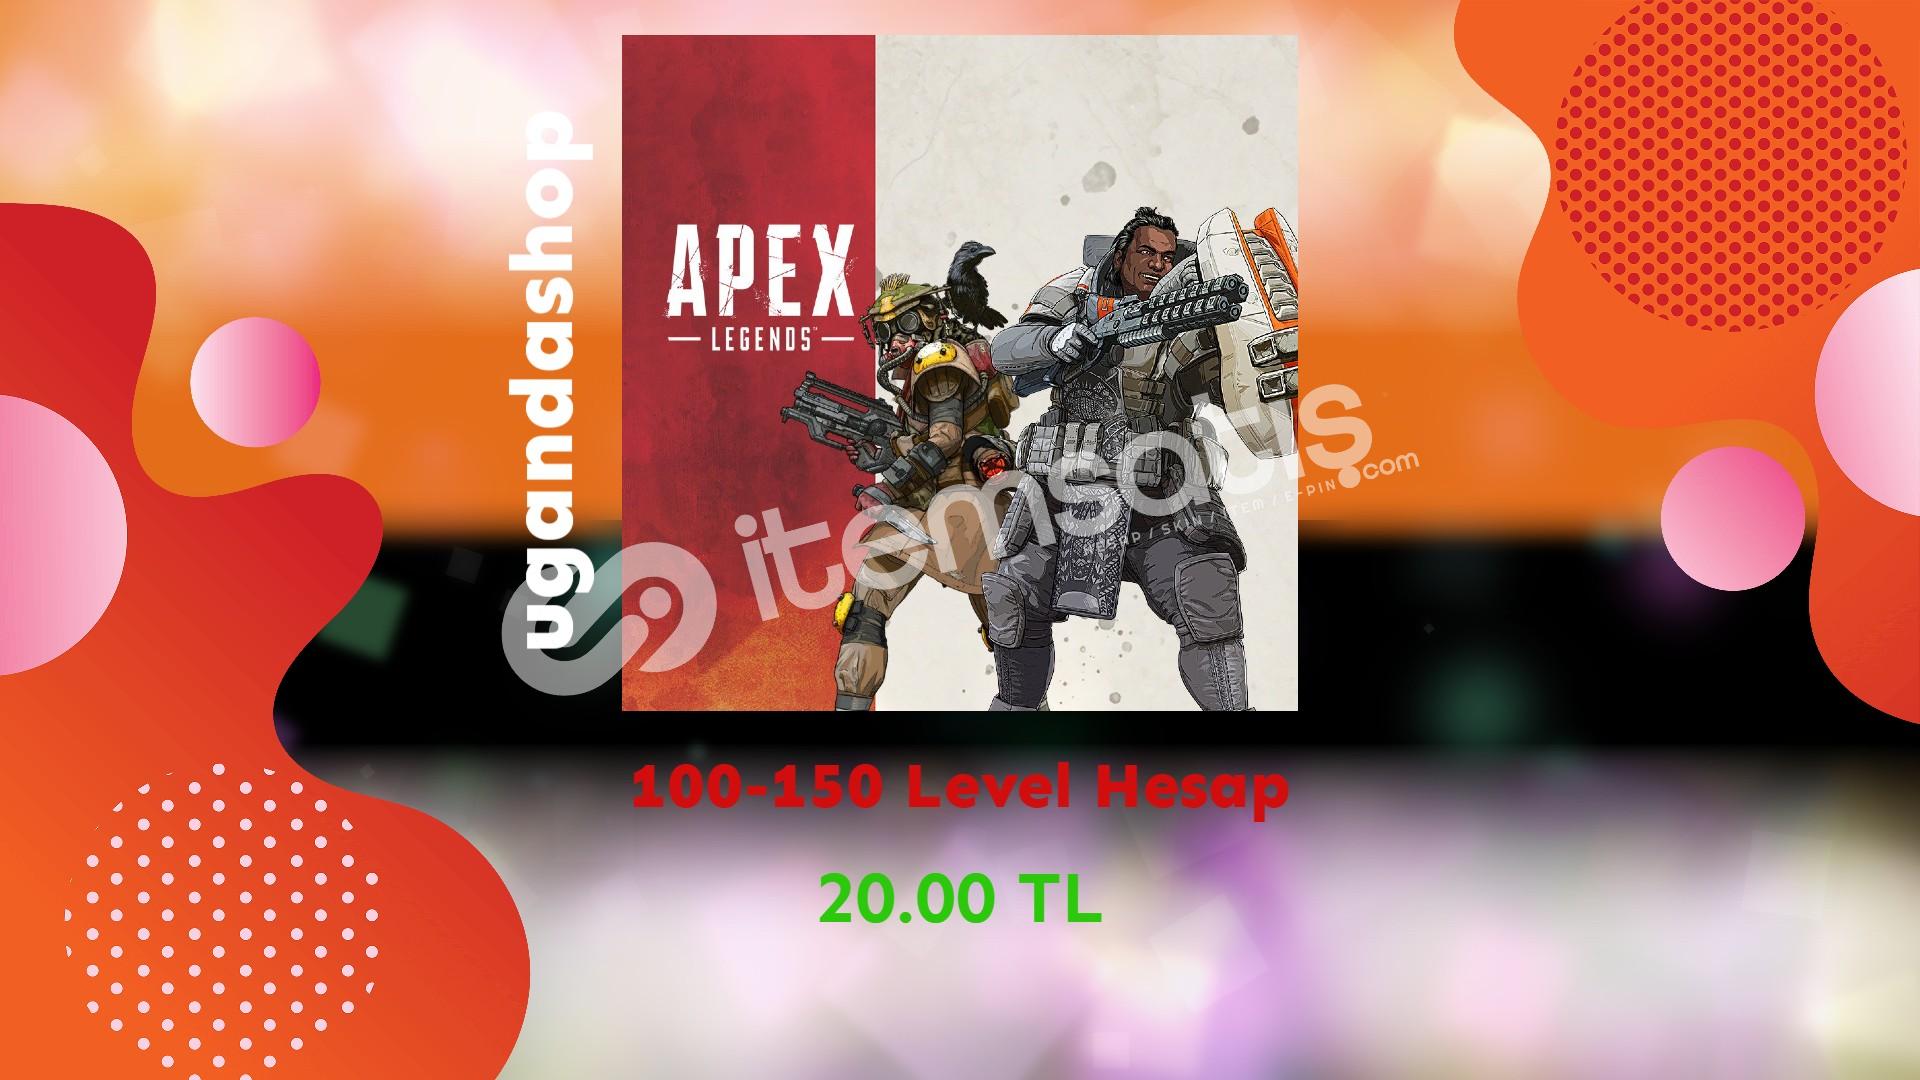 Apex Legends 100-150 Level Origin Hesap + Garanti